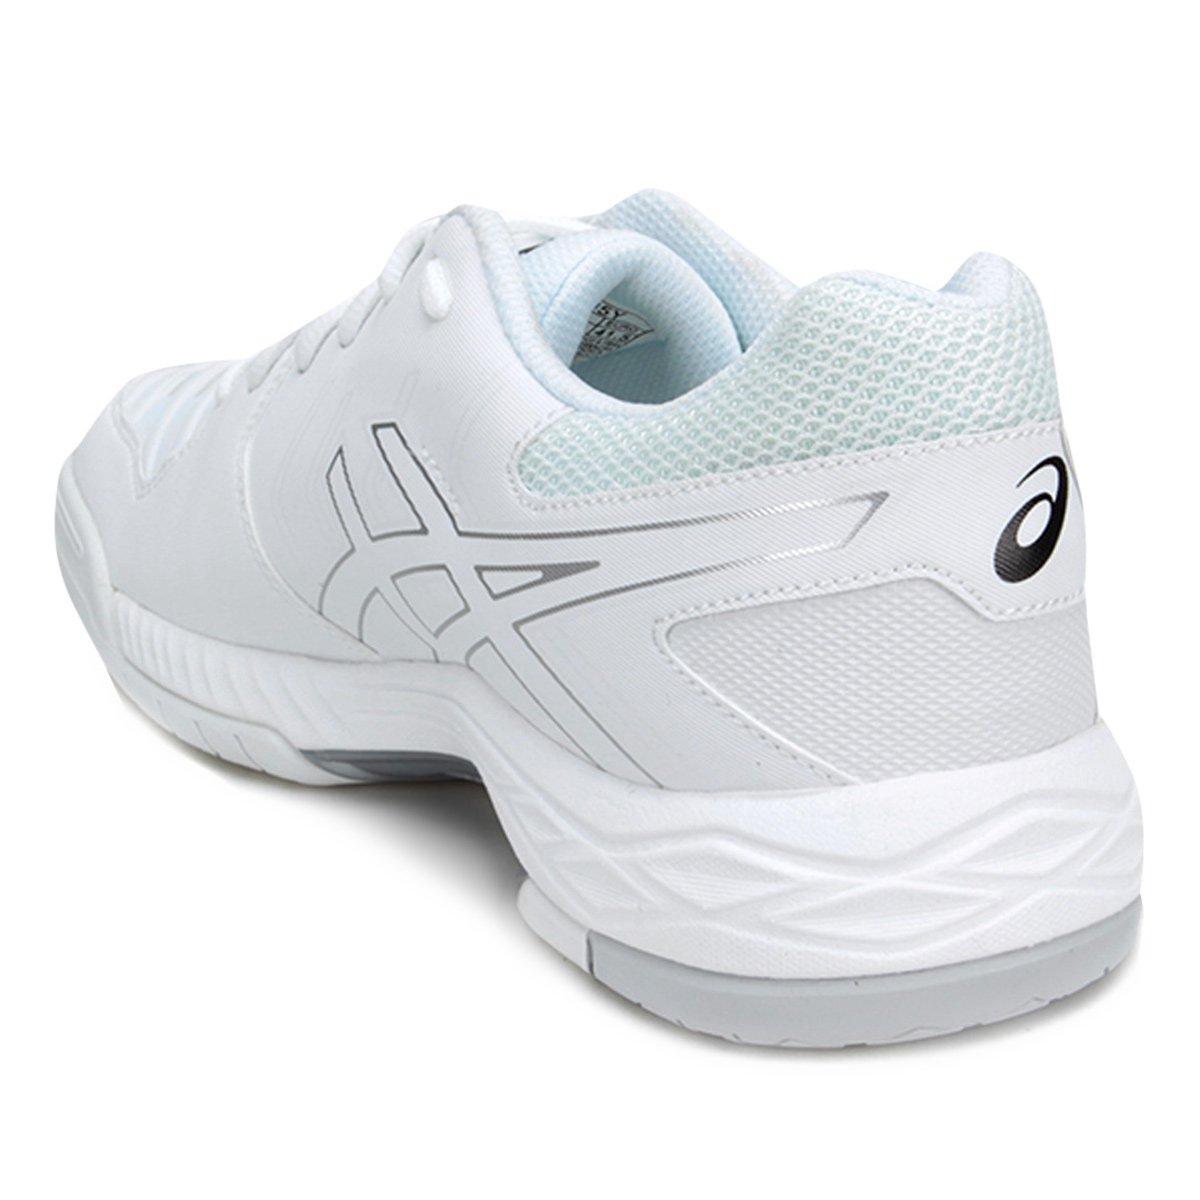 Tênis Asics Gel-Game 6 Masculino - Branco e prata - Compre Agora ... ea6503fdde735